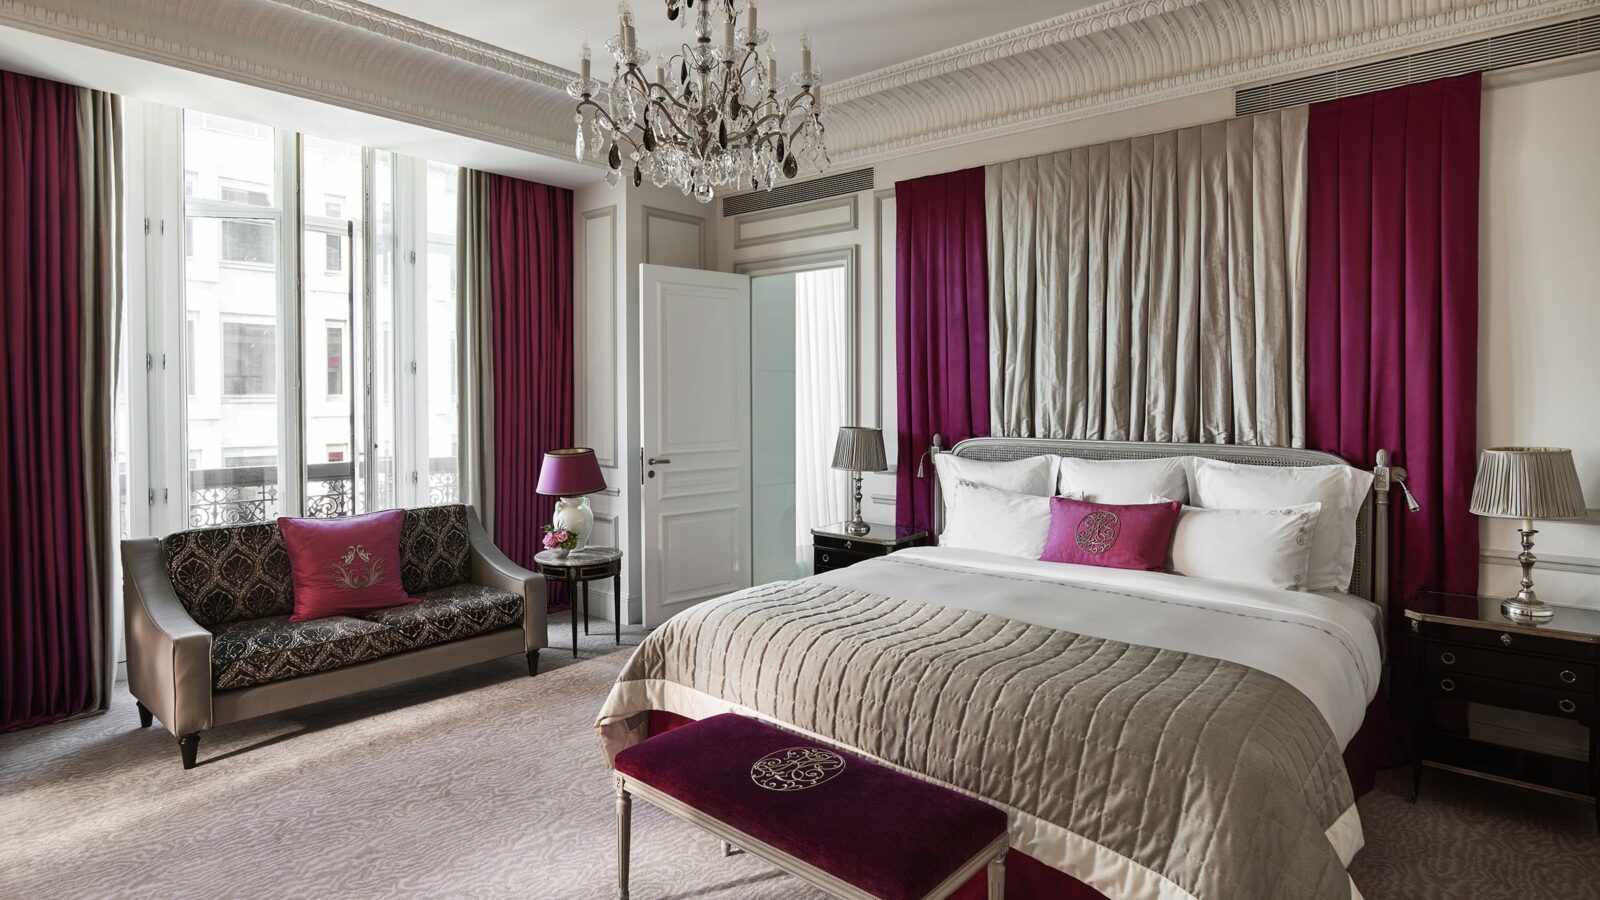 A philosophy of warm luxury